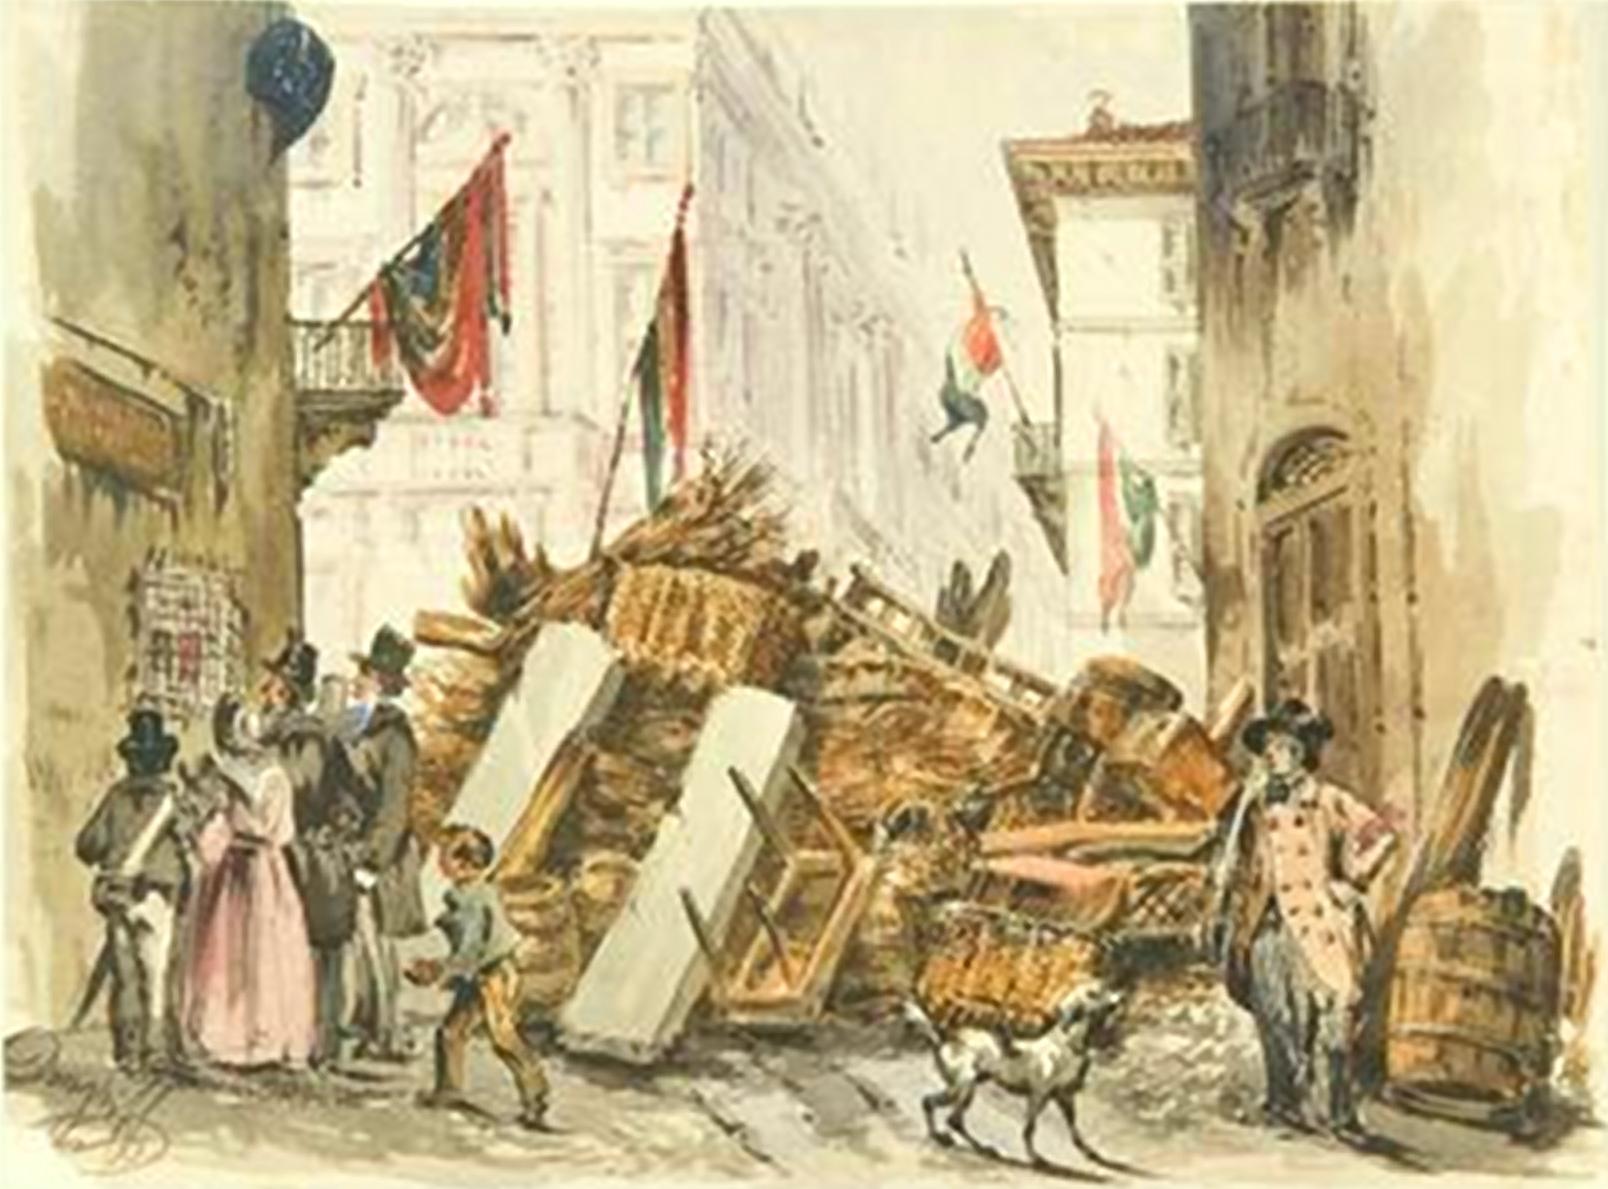 File:Donghi 5 giornate 1848.jpg